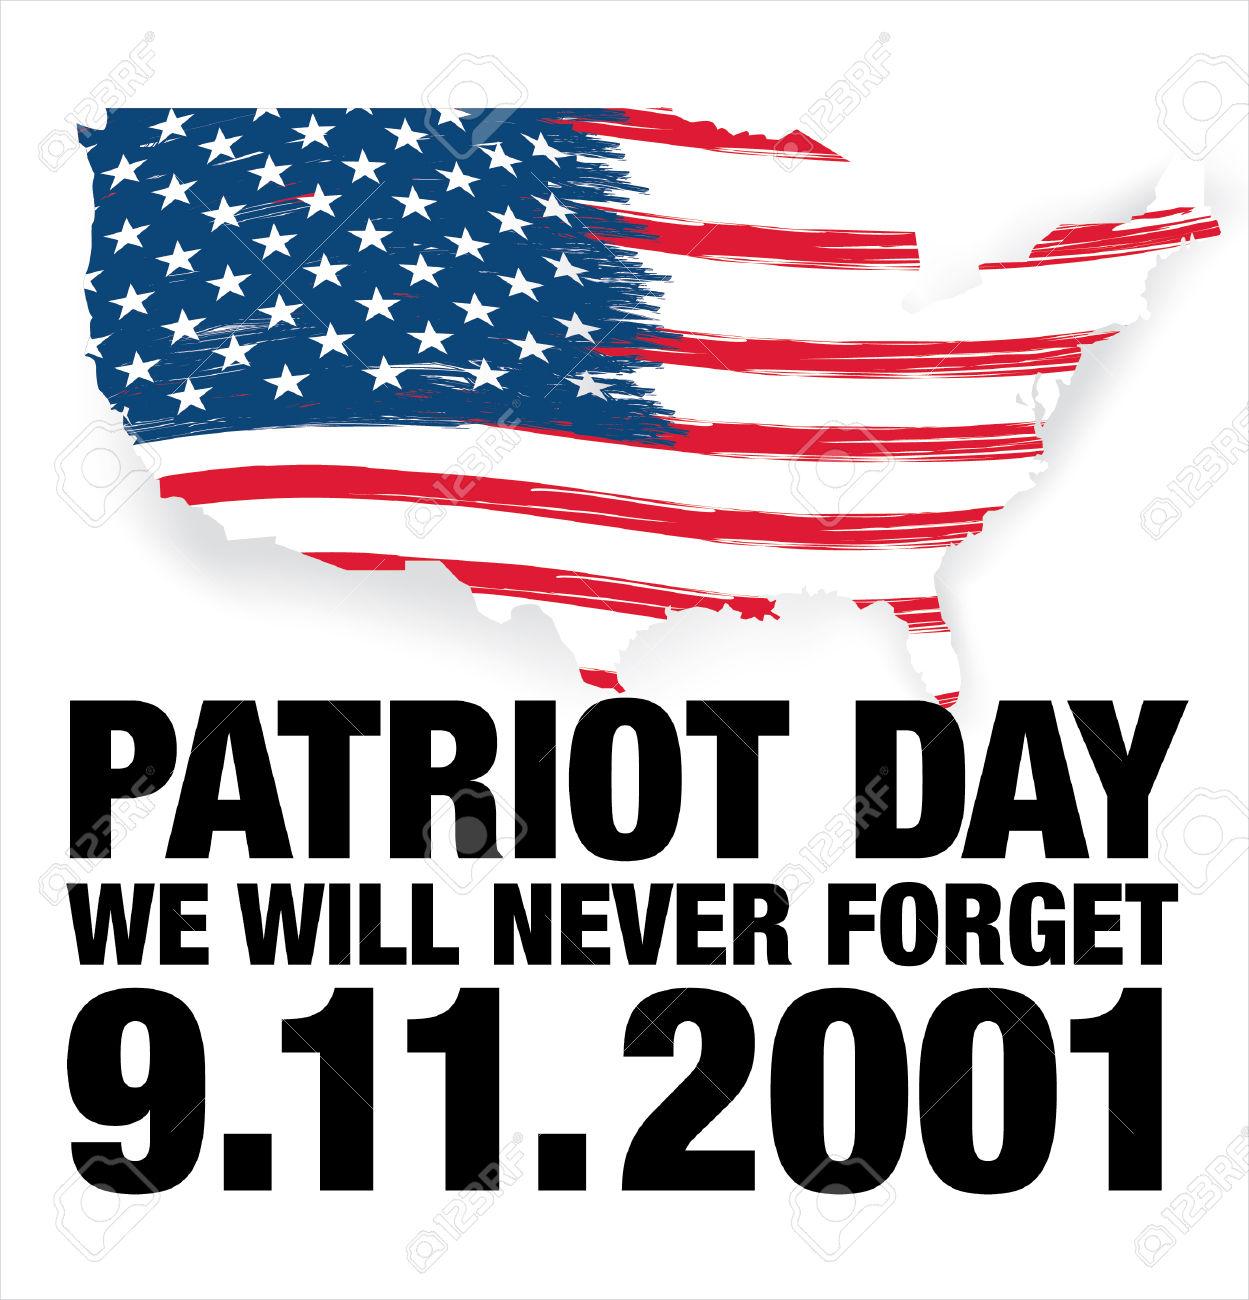 Patriots Day, April 19 1775